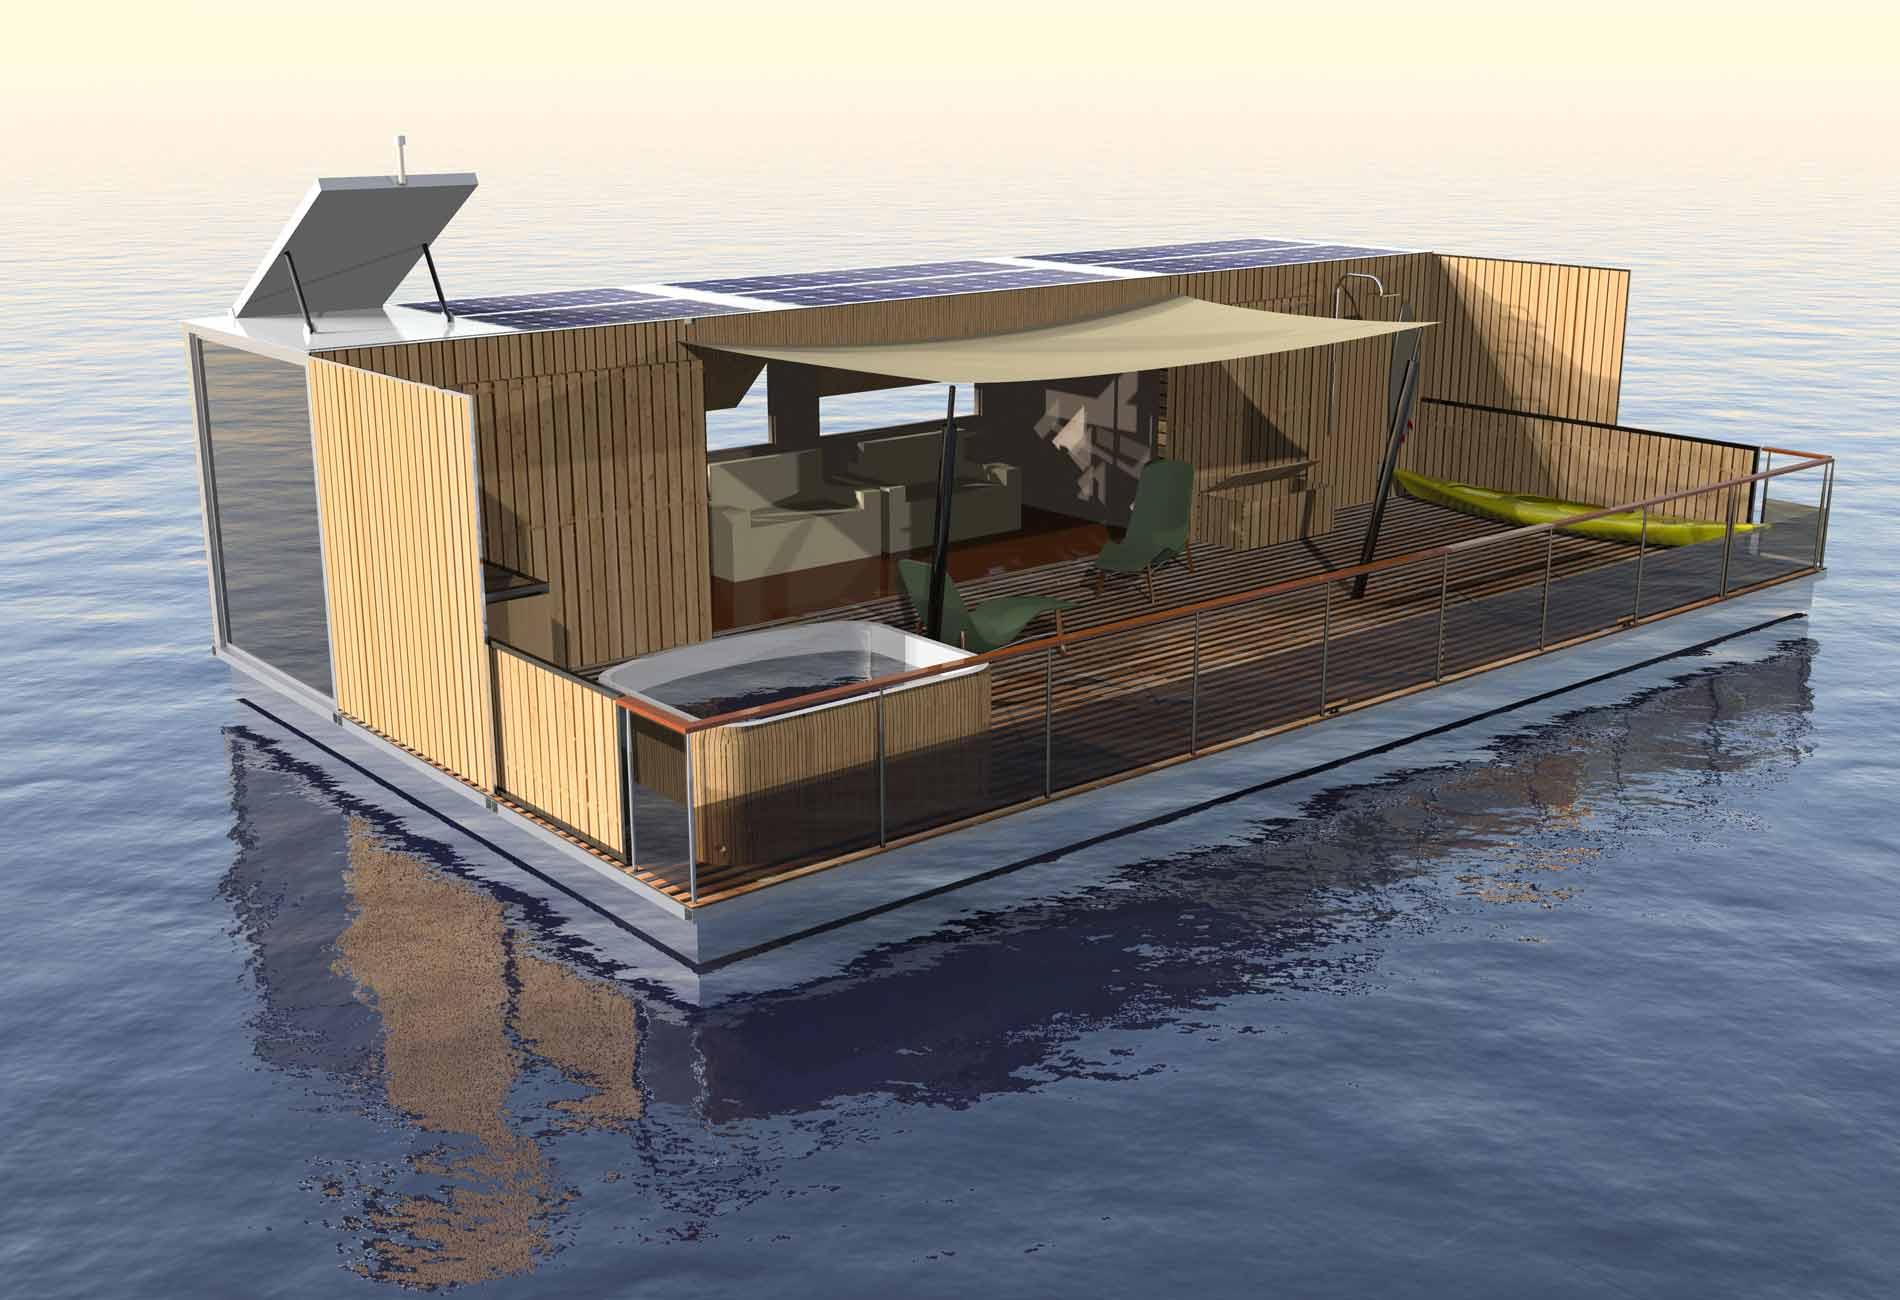 HouseBoat-Architecte-Vincent-Lebailly-Format-container-maison-flottante-Innovation